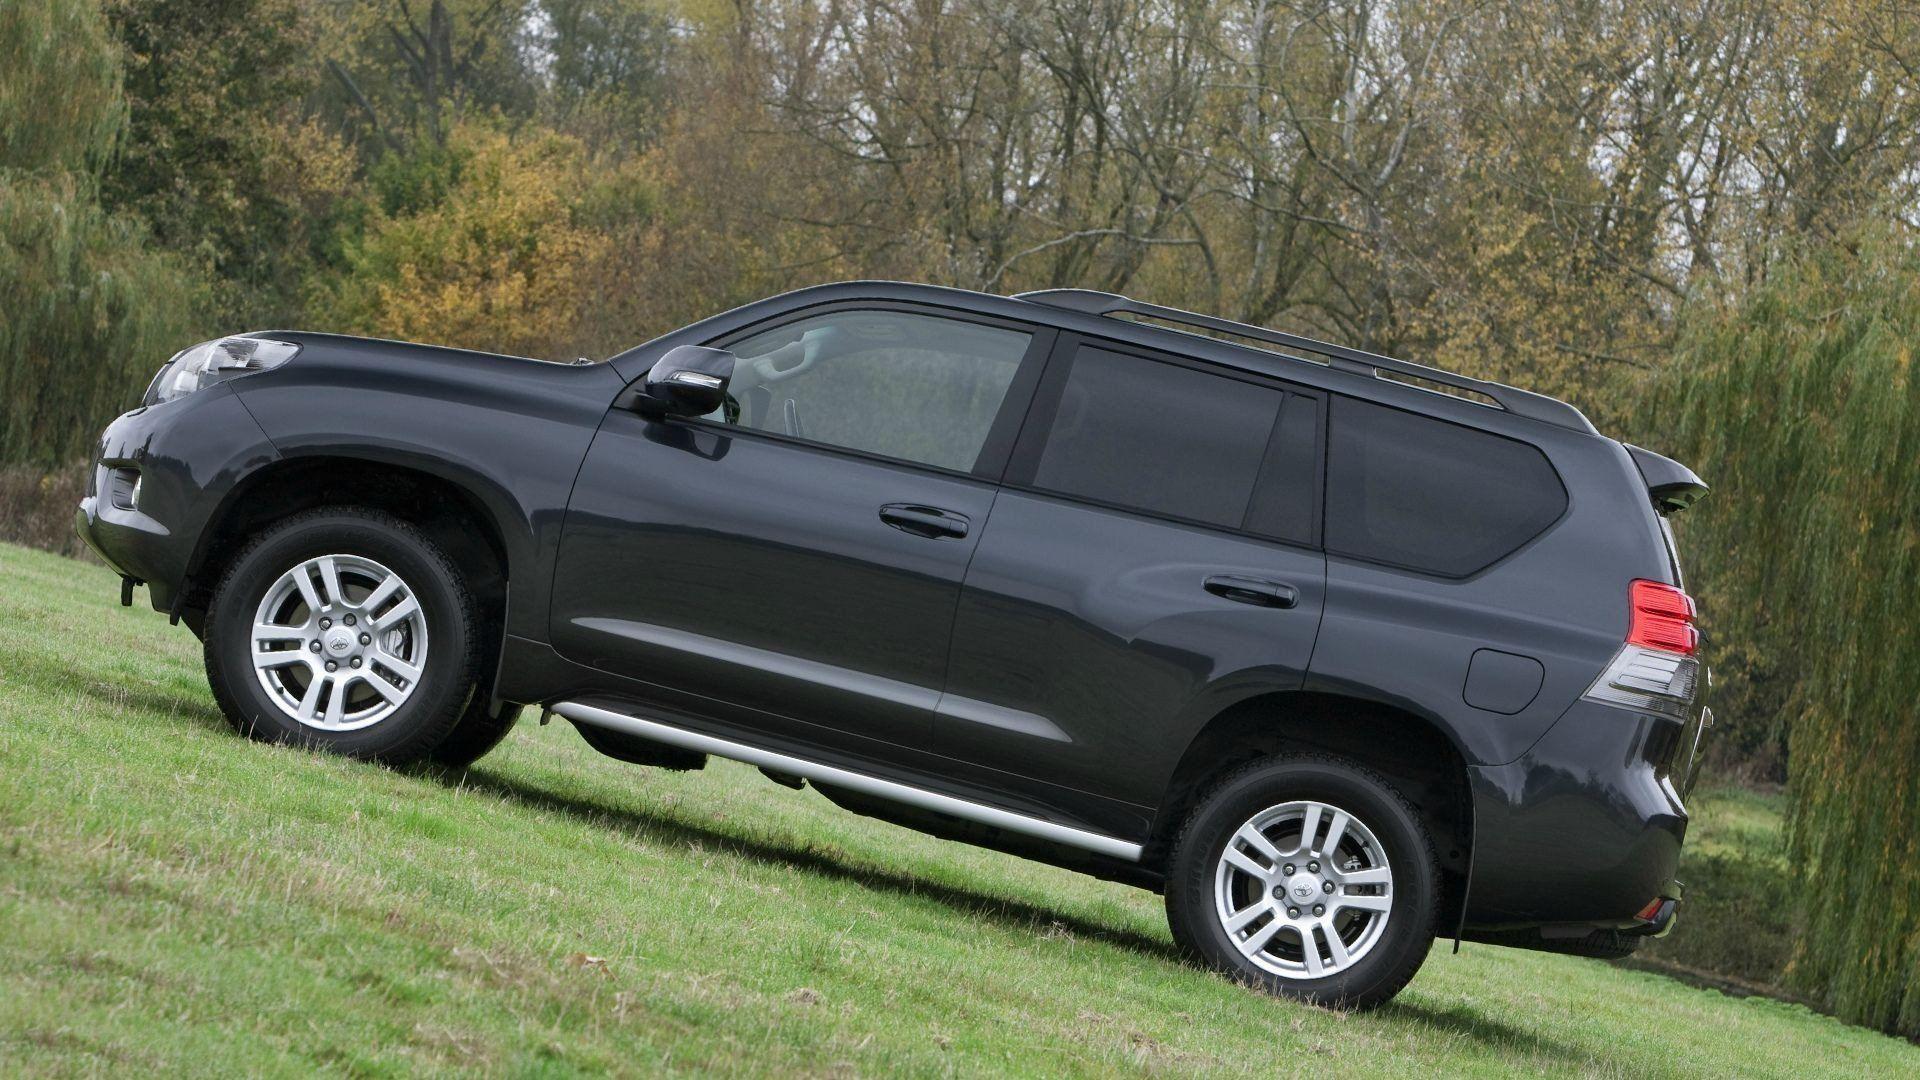 2021 Toyota Hilux Spy Shots Spesification In 2020 Toyota Hilux Toyota Land Cruiser Prado Toyota Land Cruiser